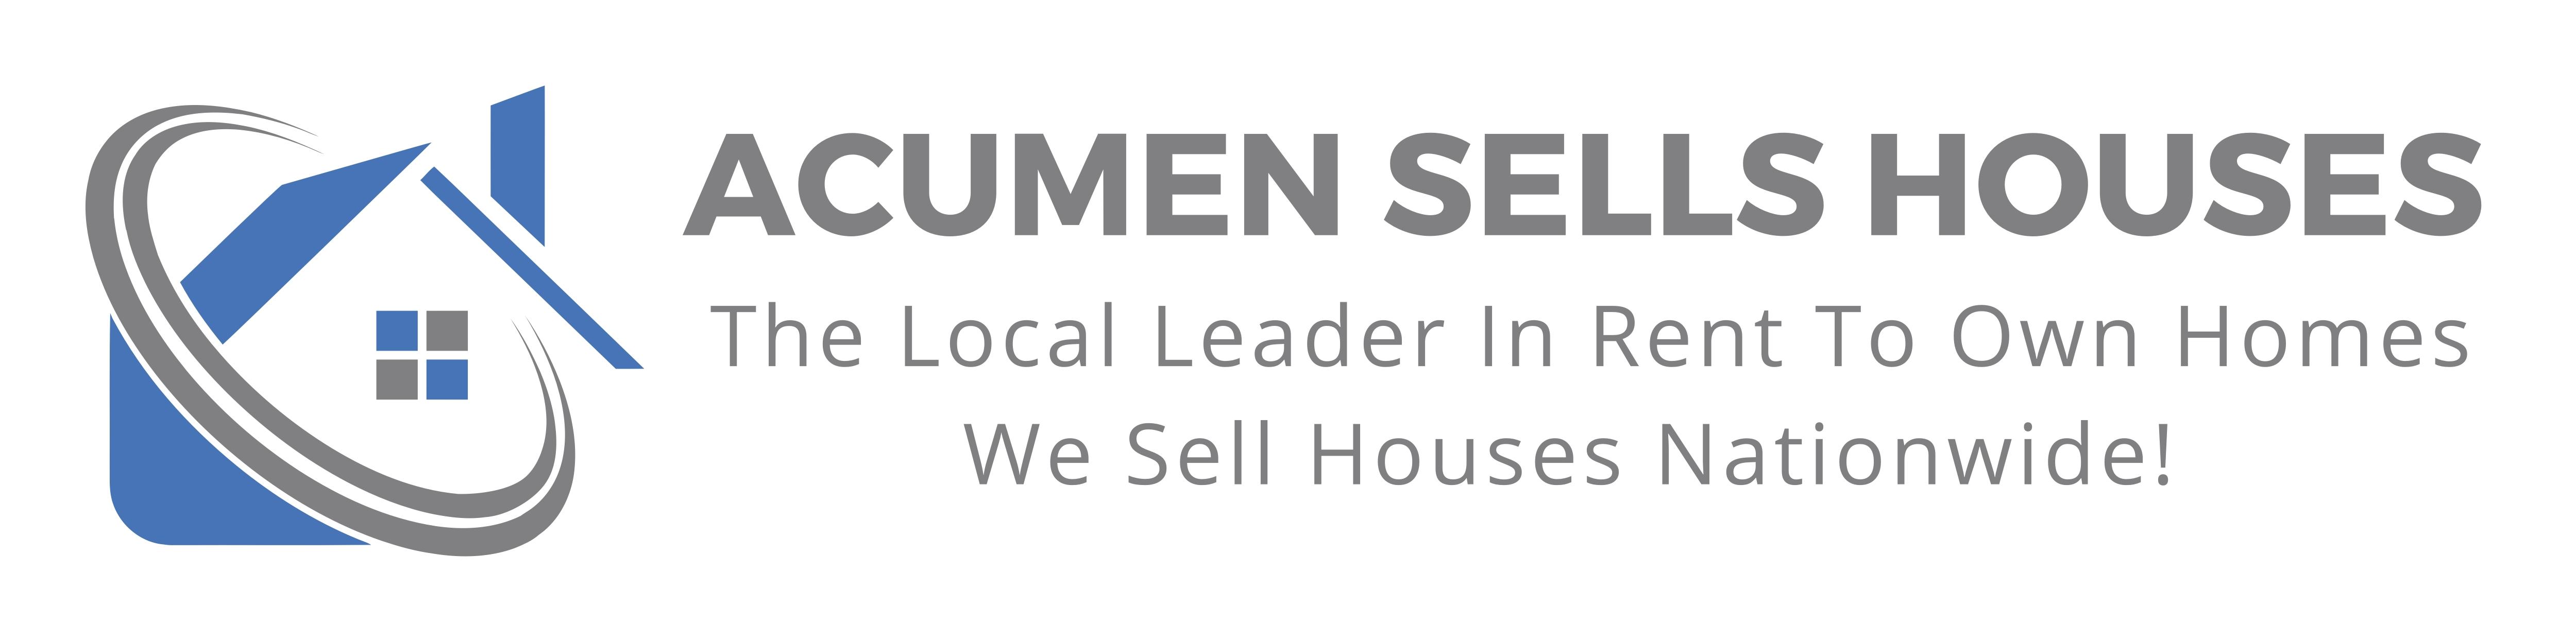 ACUMEN SELLS HOUSES